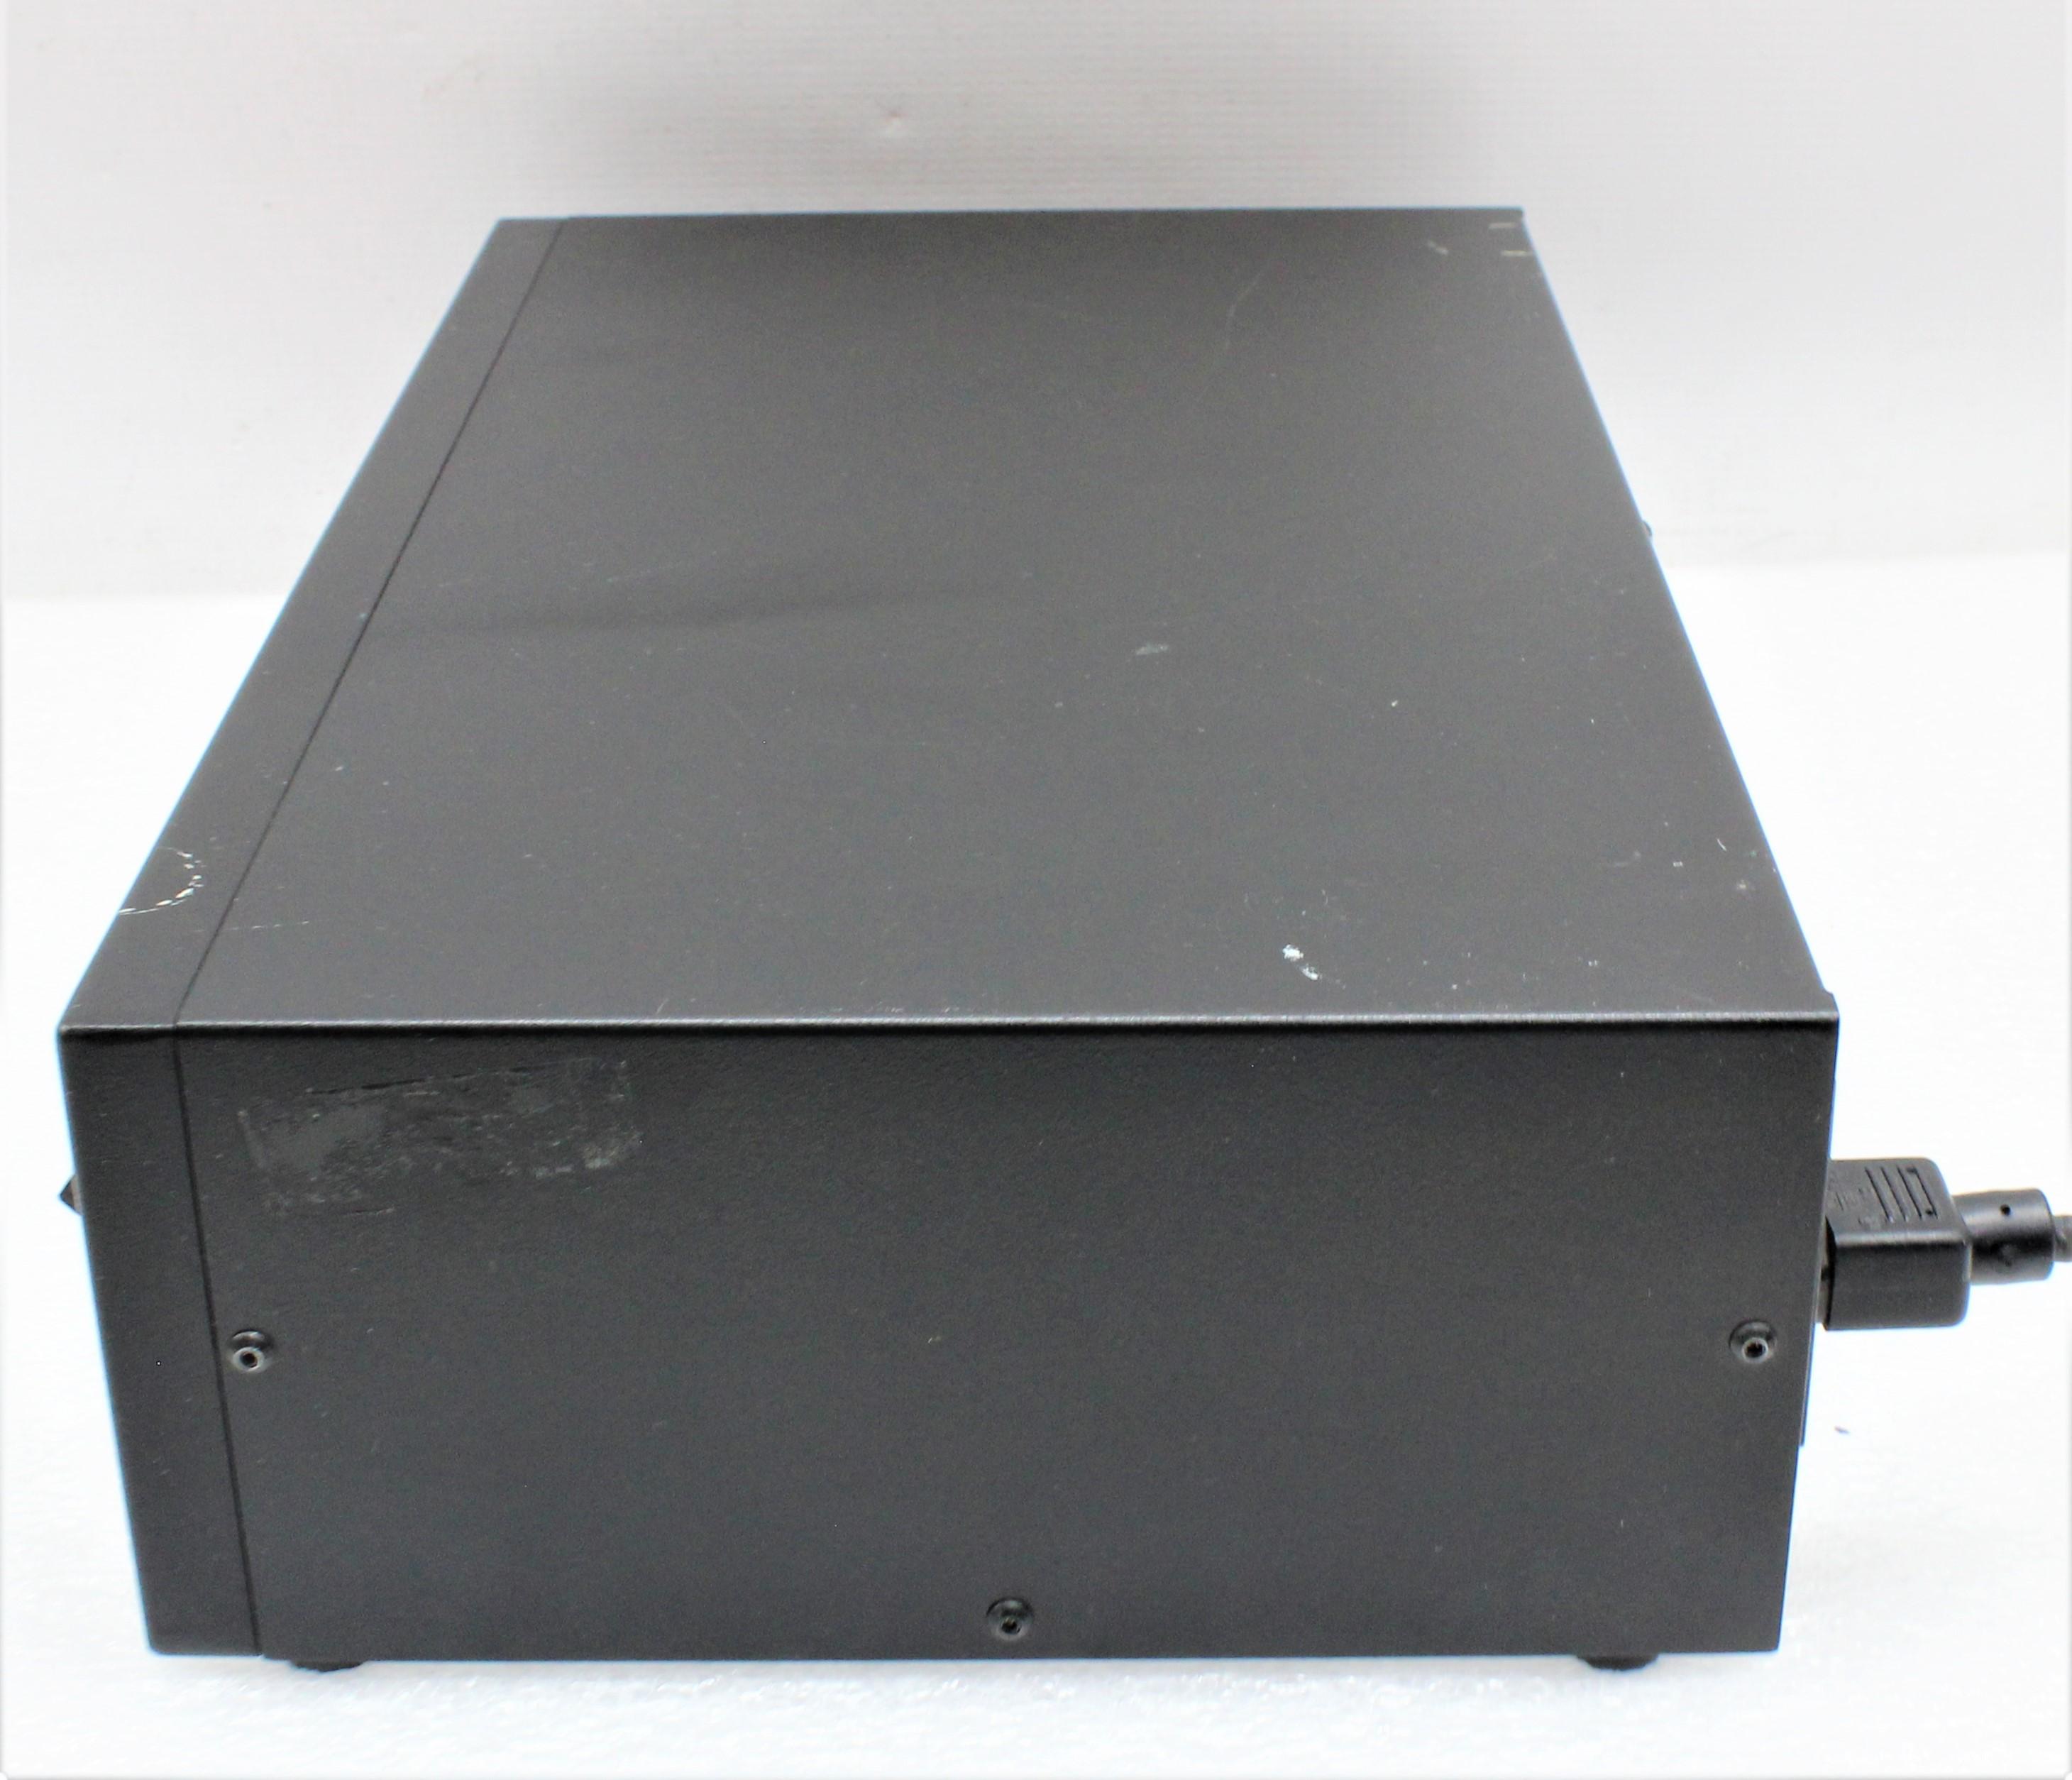 Image T-TECH Quick Circuit Router Controller 1587072